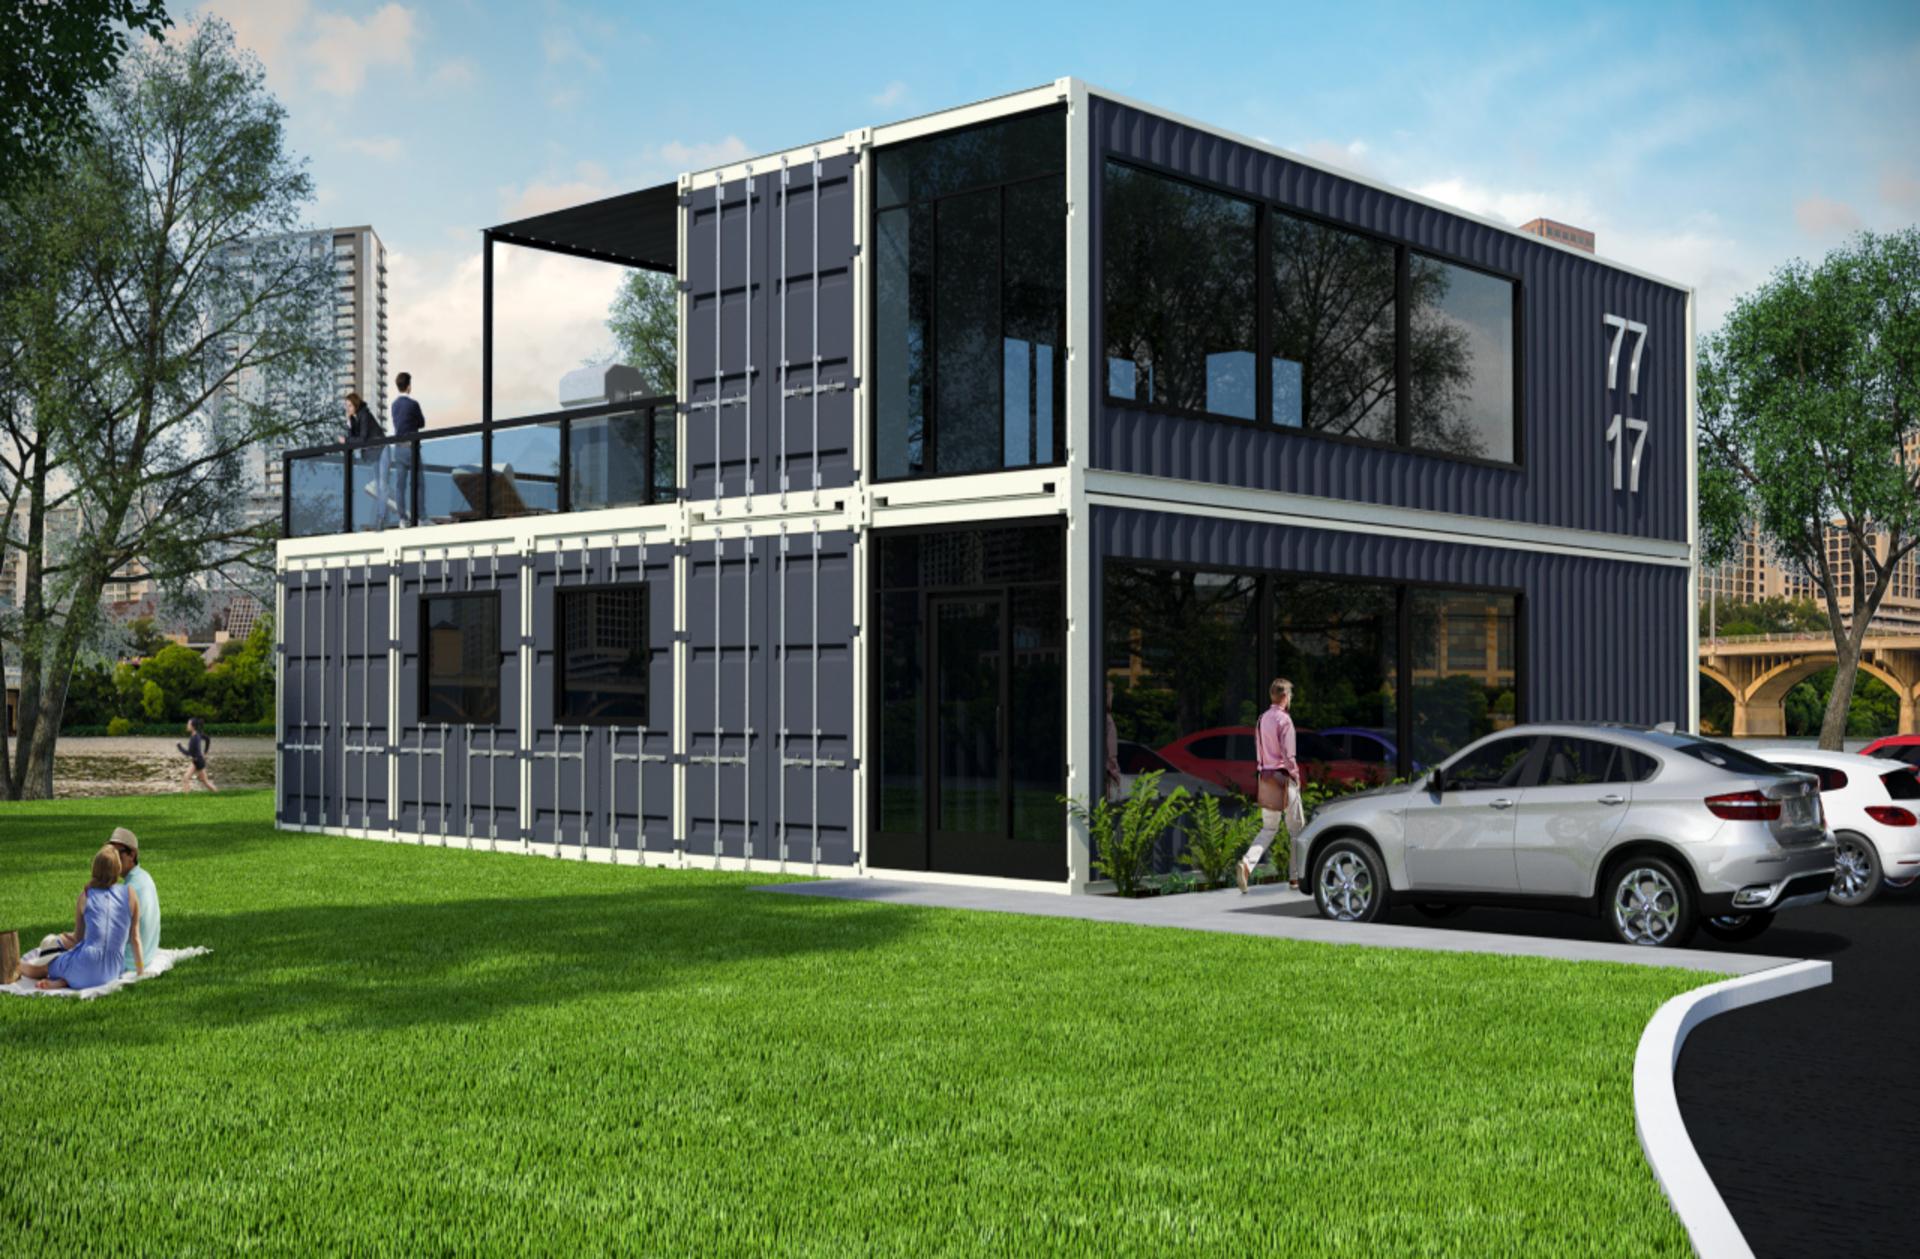 multi_container_apartment_rendering_large